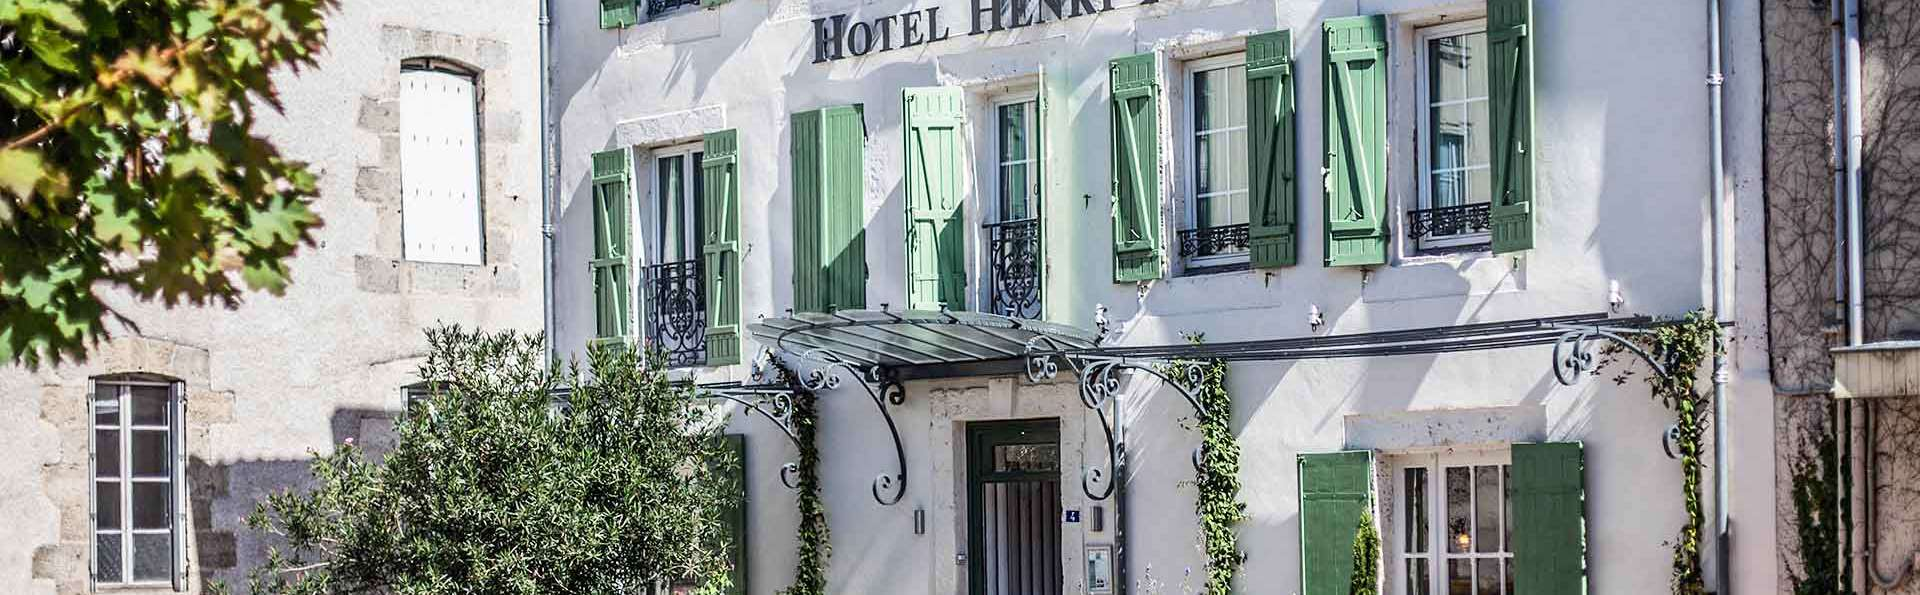 Hôtel Henri IV - EDIT_HENRIIV_03.jpg